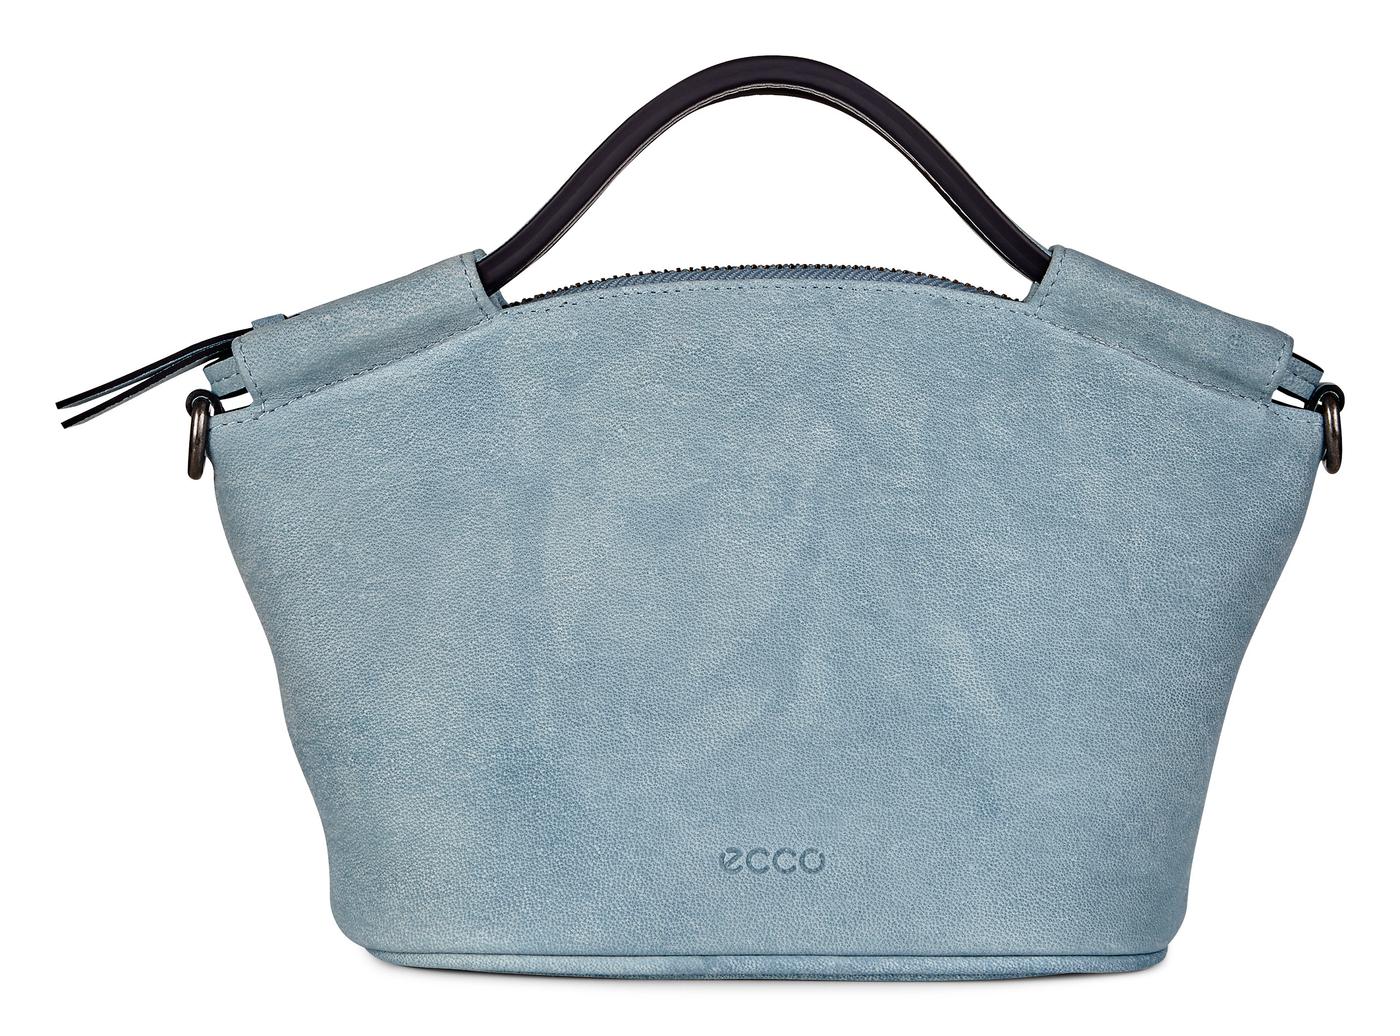 b179189abe SP 2 Small Doctors Bag | Women's Handbags | ECCO® Shoes